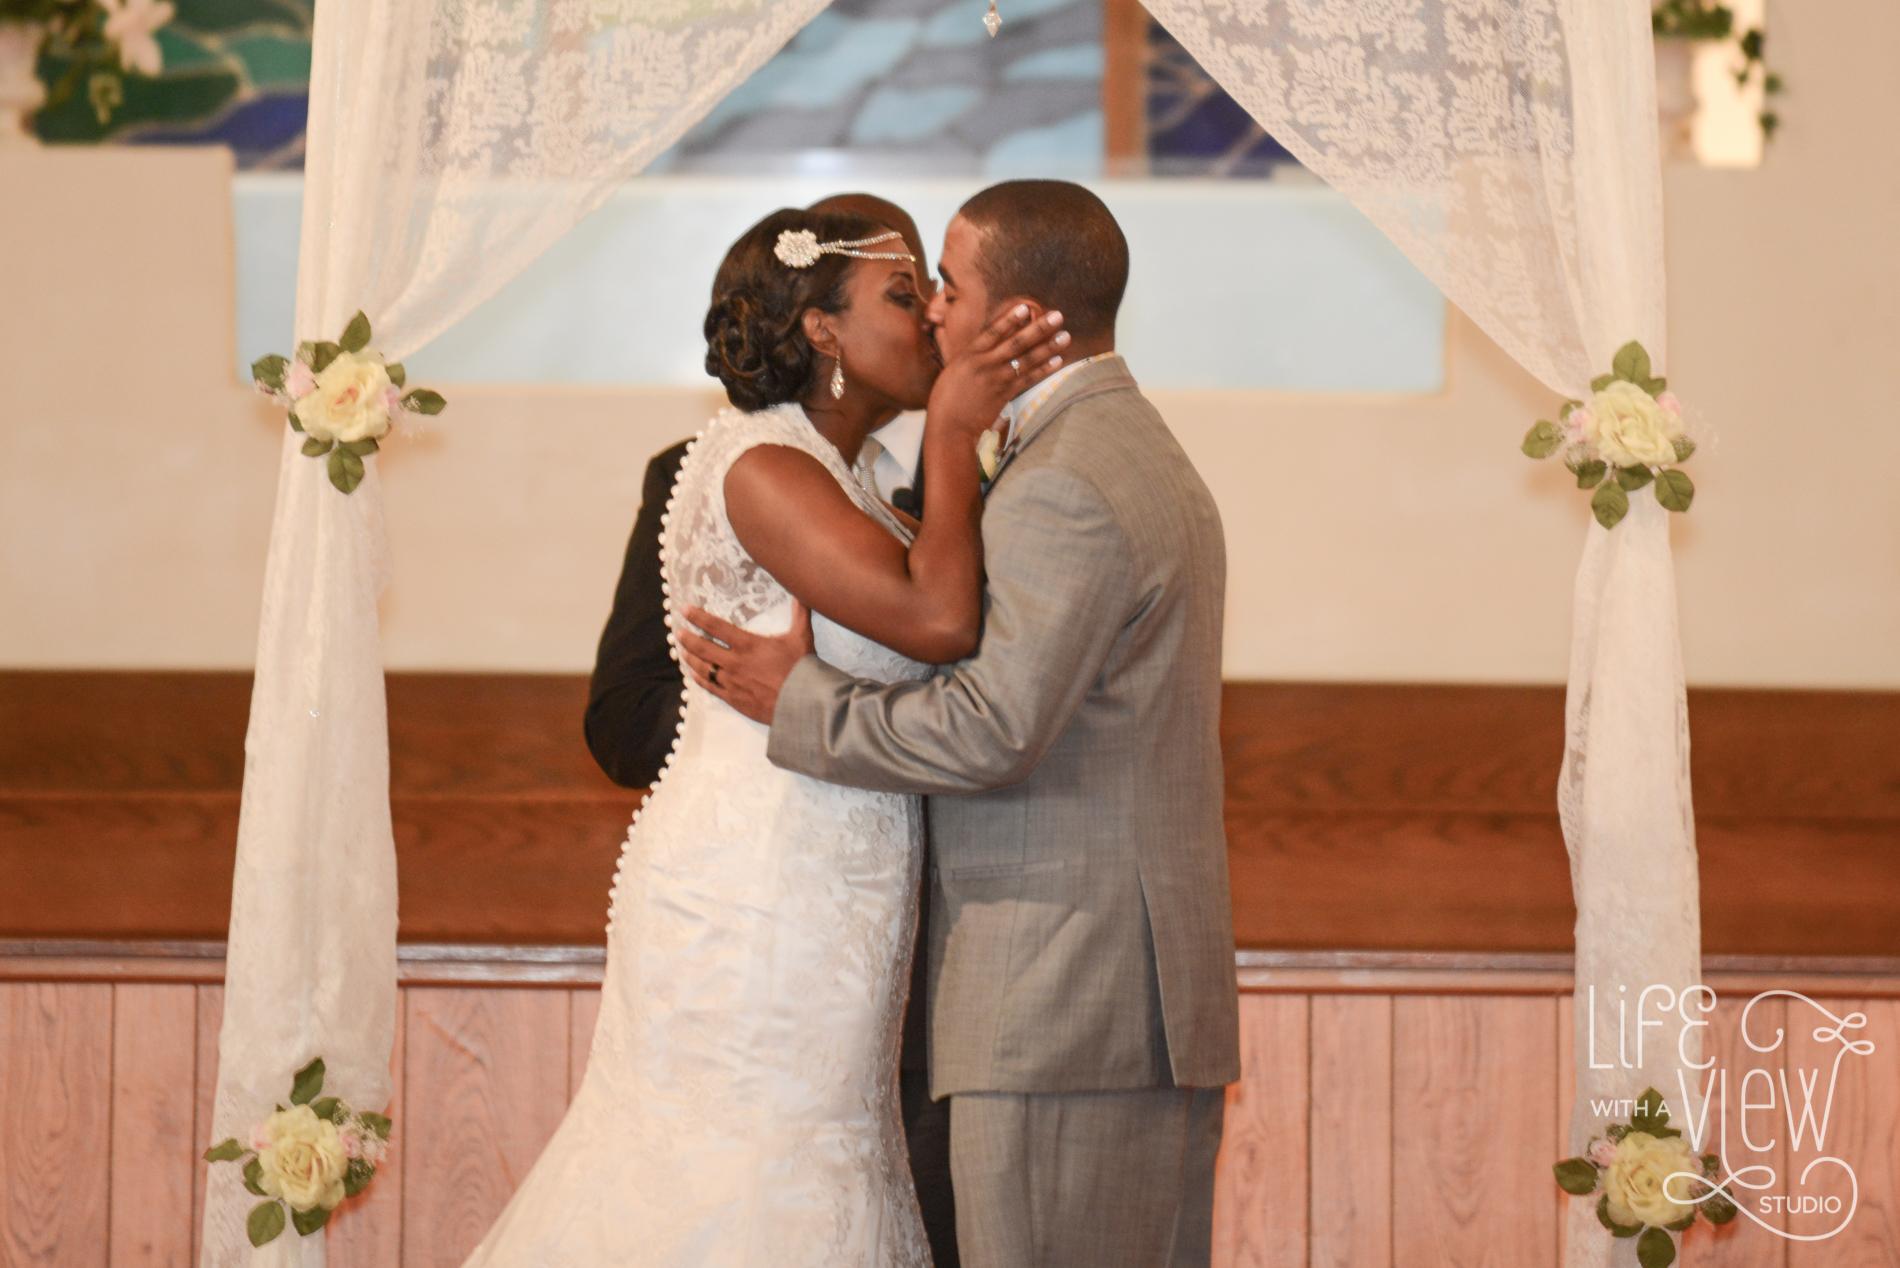 Stratton-Hall-Wedding-32.jpg